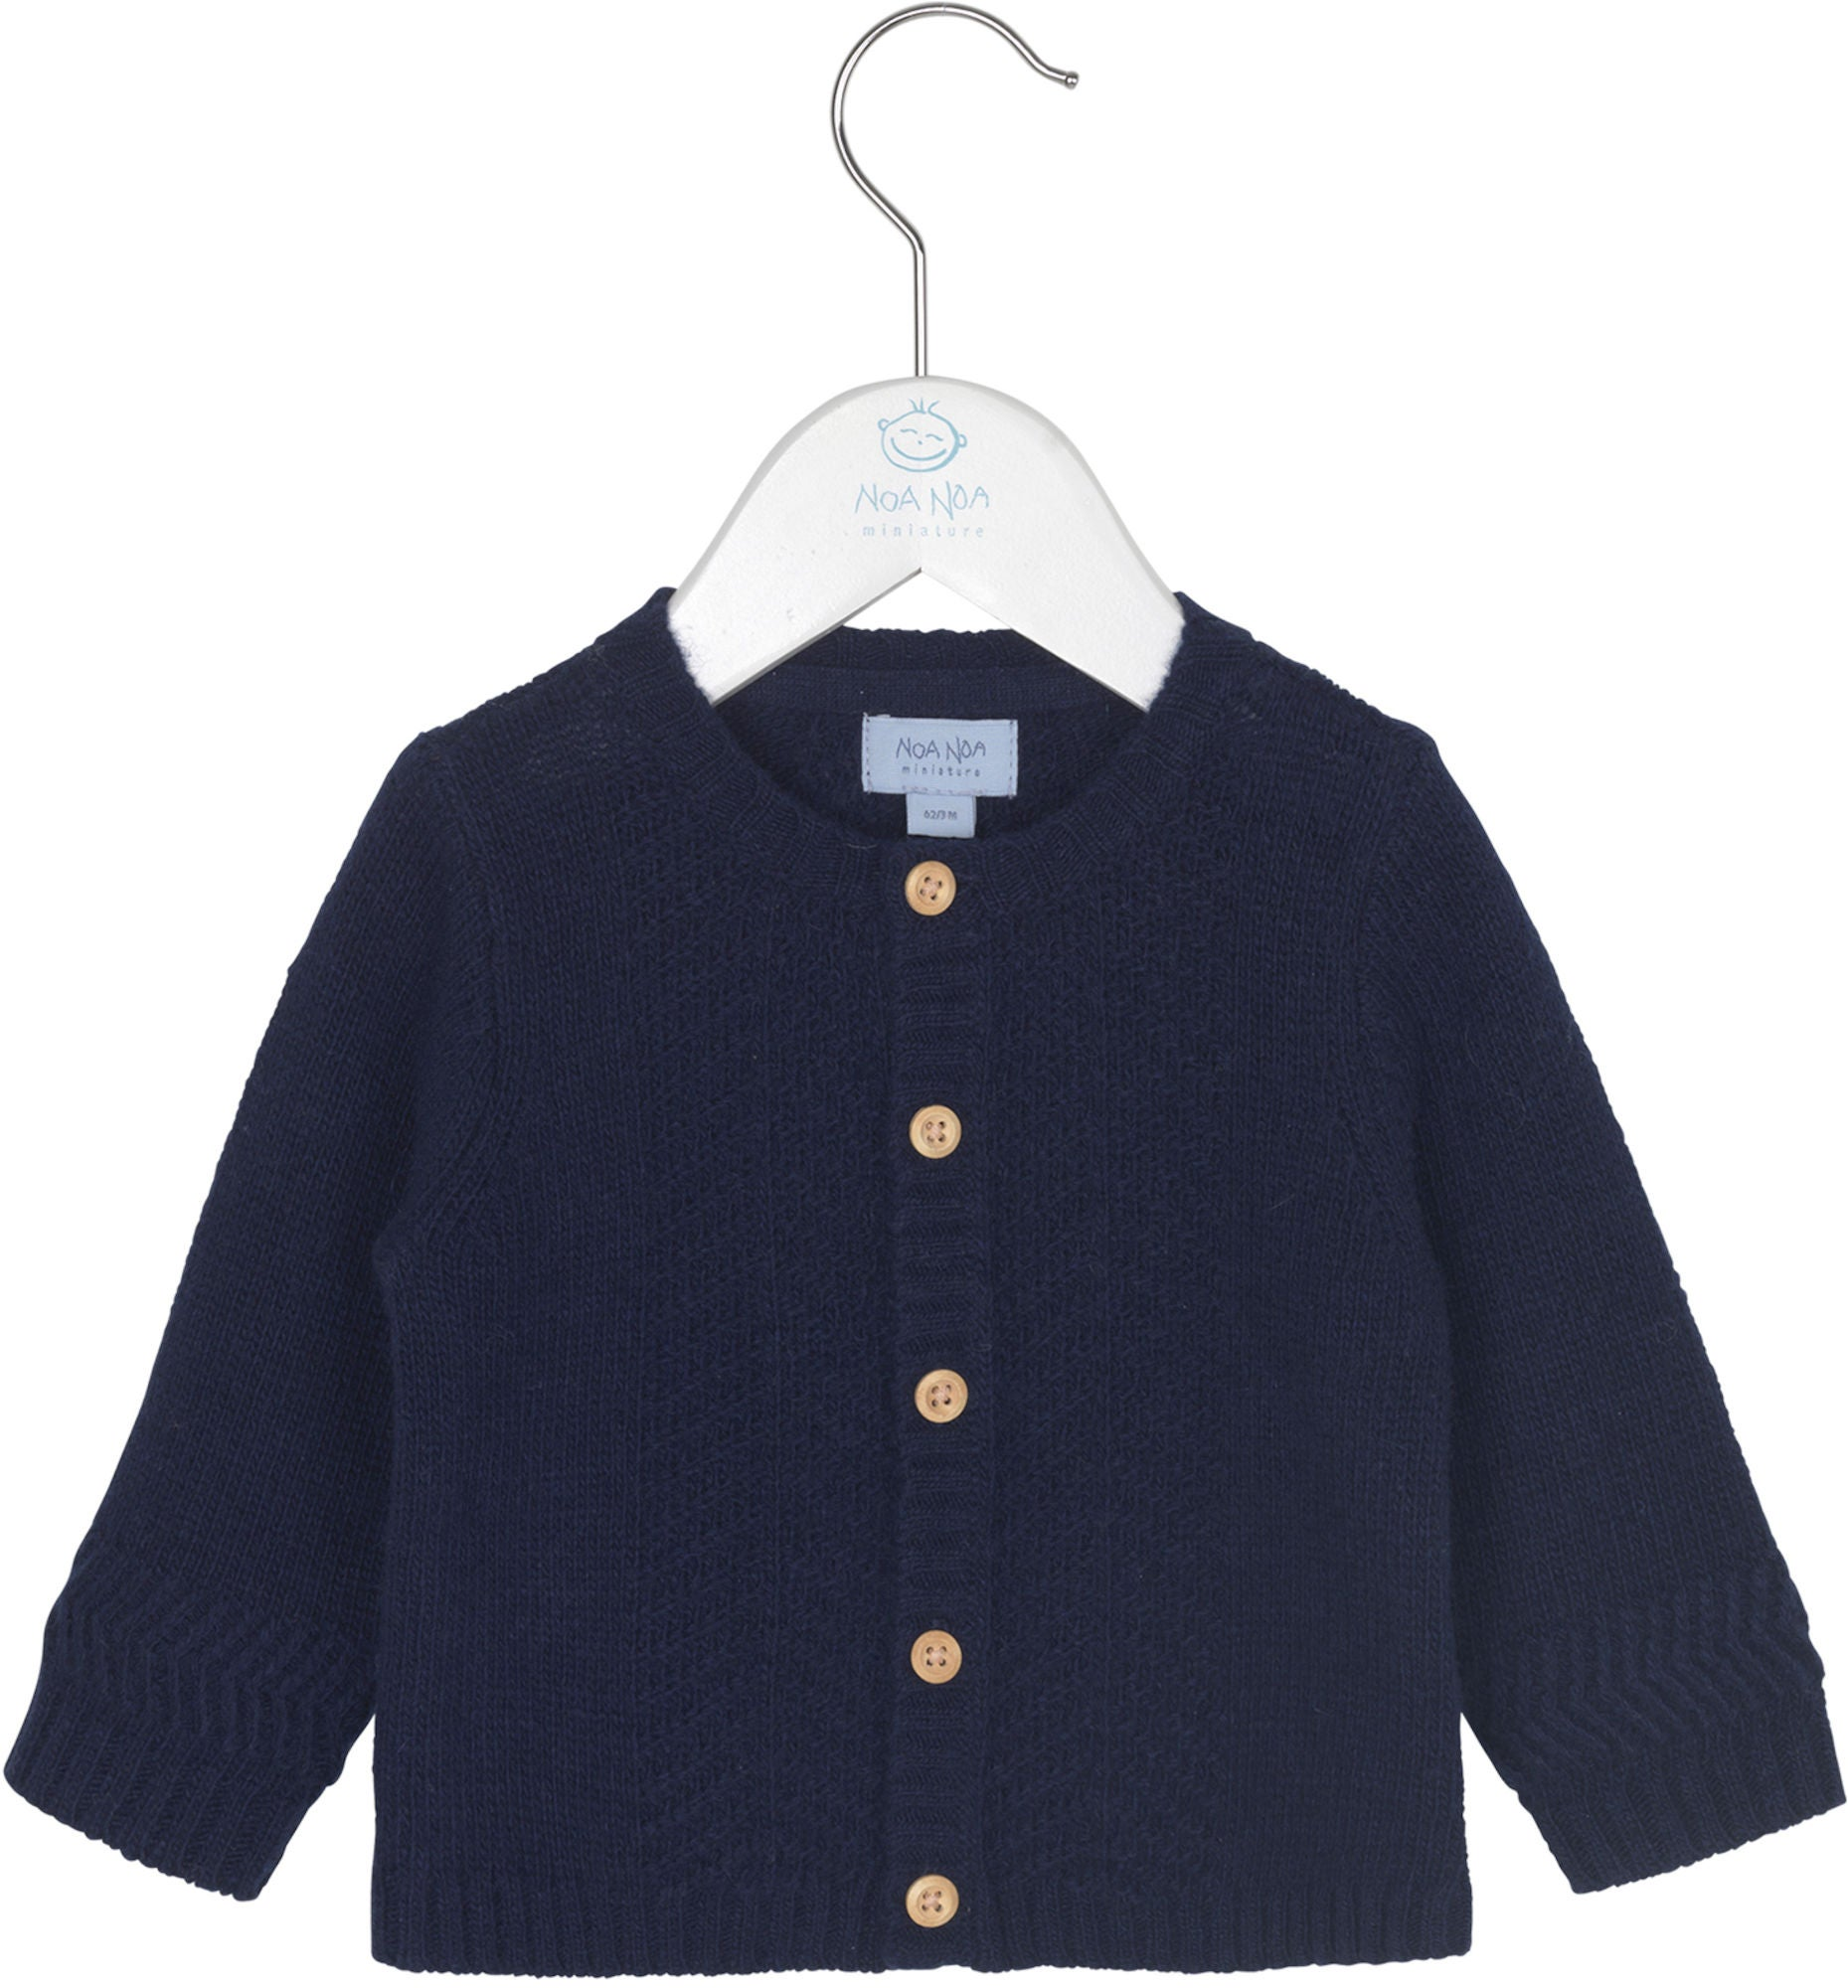 ceda8add Køb Noa Noa Miniature Cardigan, Dress Blue   Jollyroom